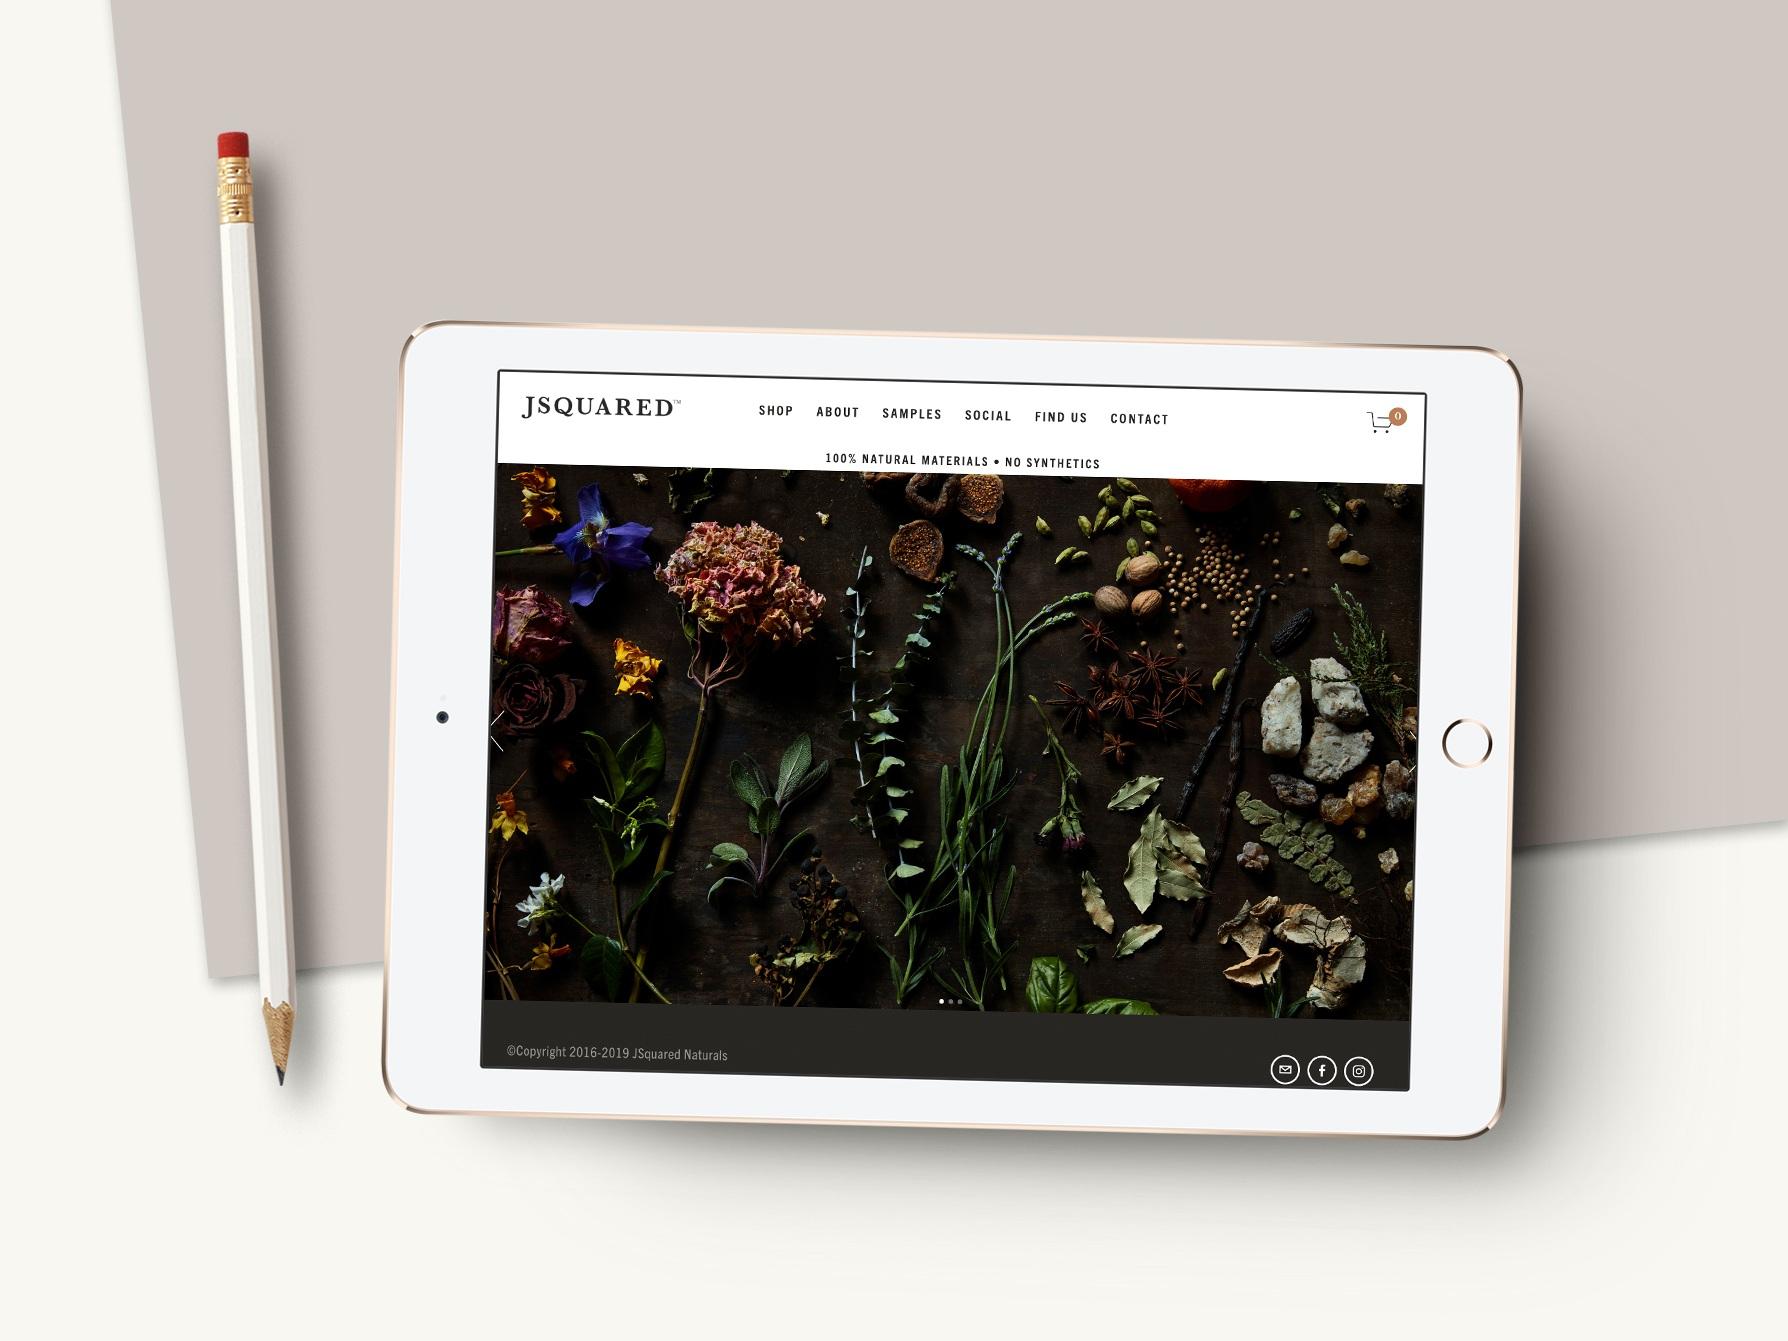 iPadAir_jsquared_mockup.jpg